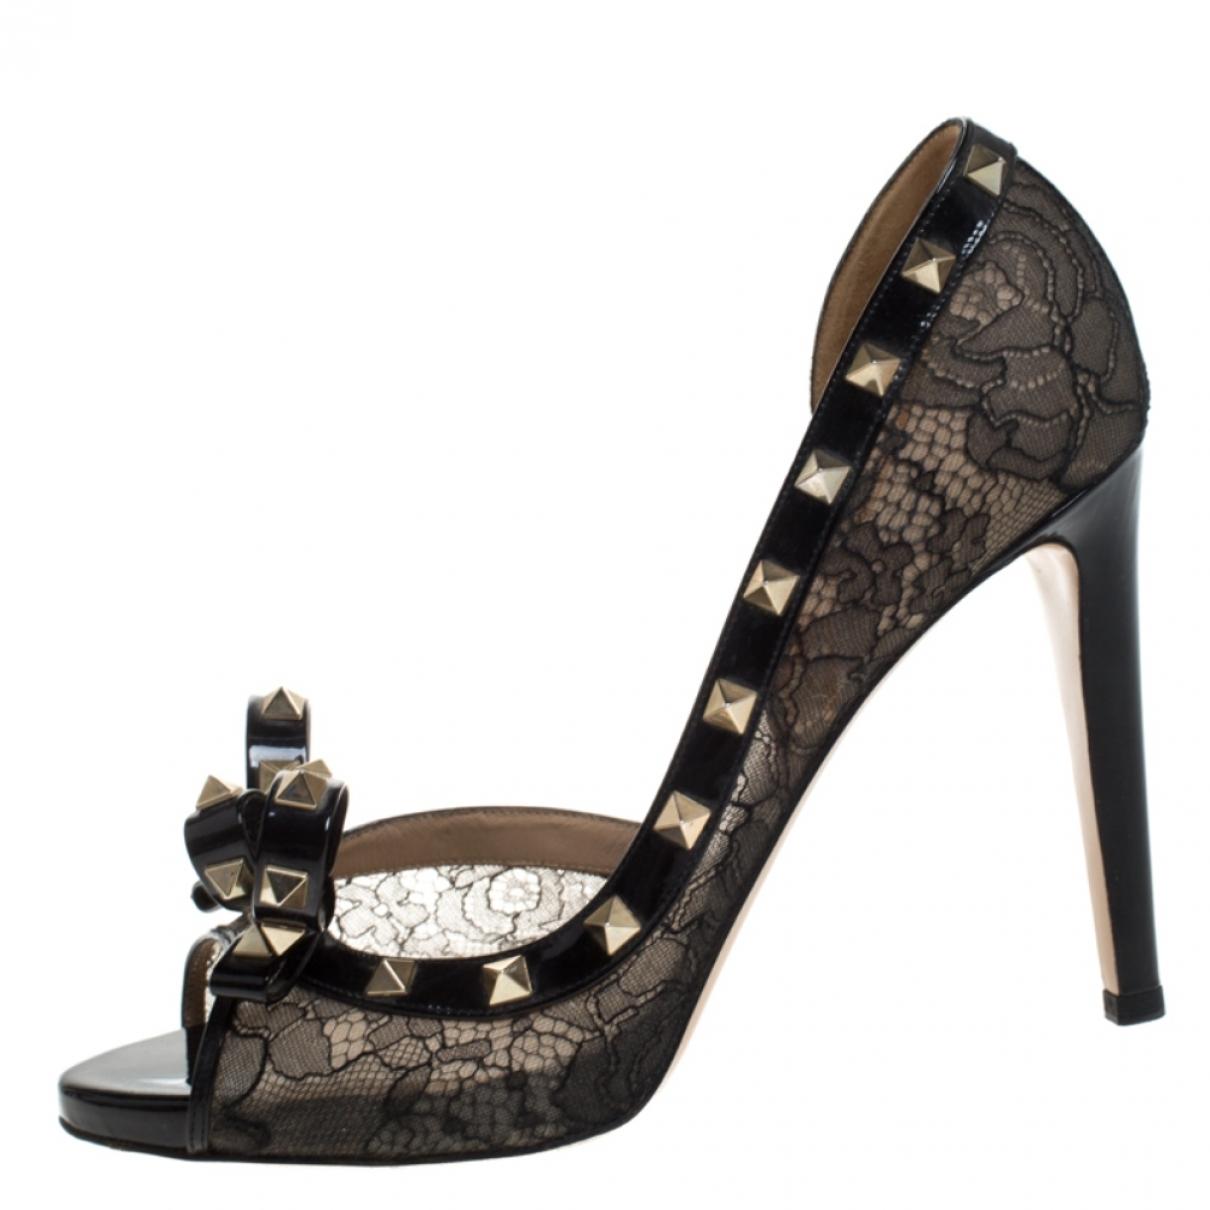 Valentino Garavani Rockstud Black Leather Heels for Women 9 US